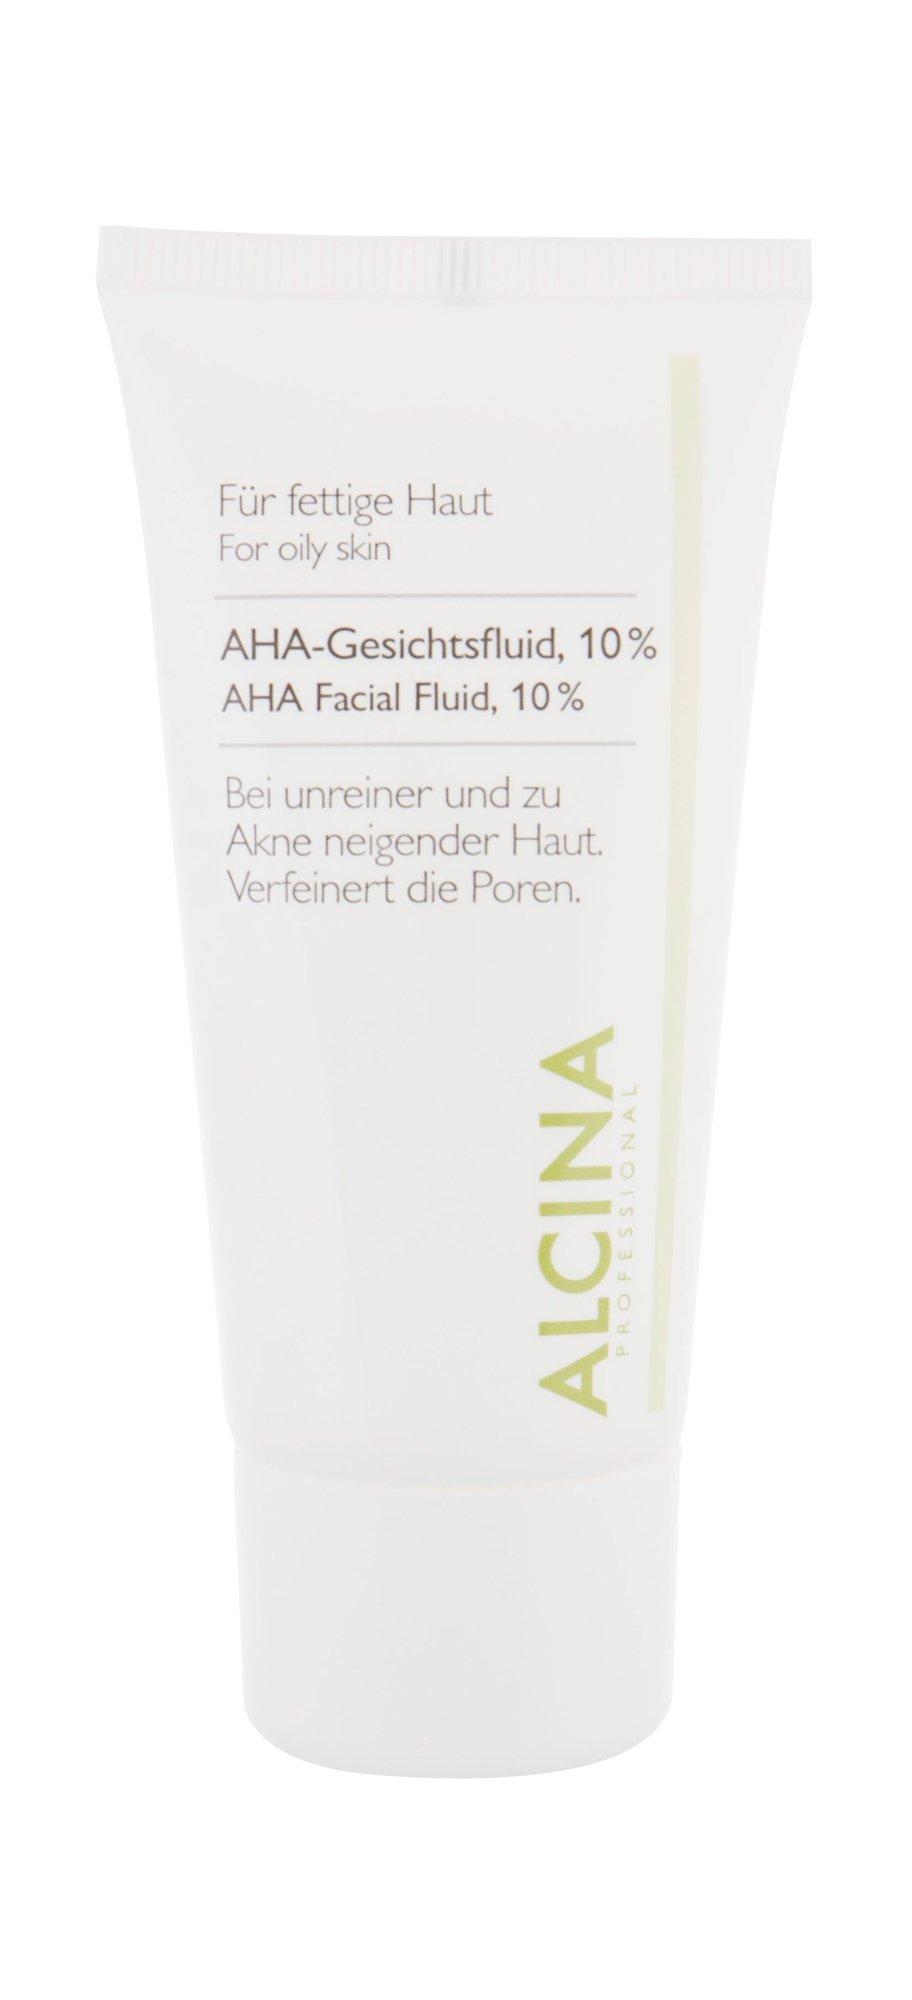 ALCINA For Oily Skin Night Skin Cream 50ml  AHA Facial Fluid, 10%